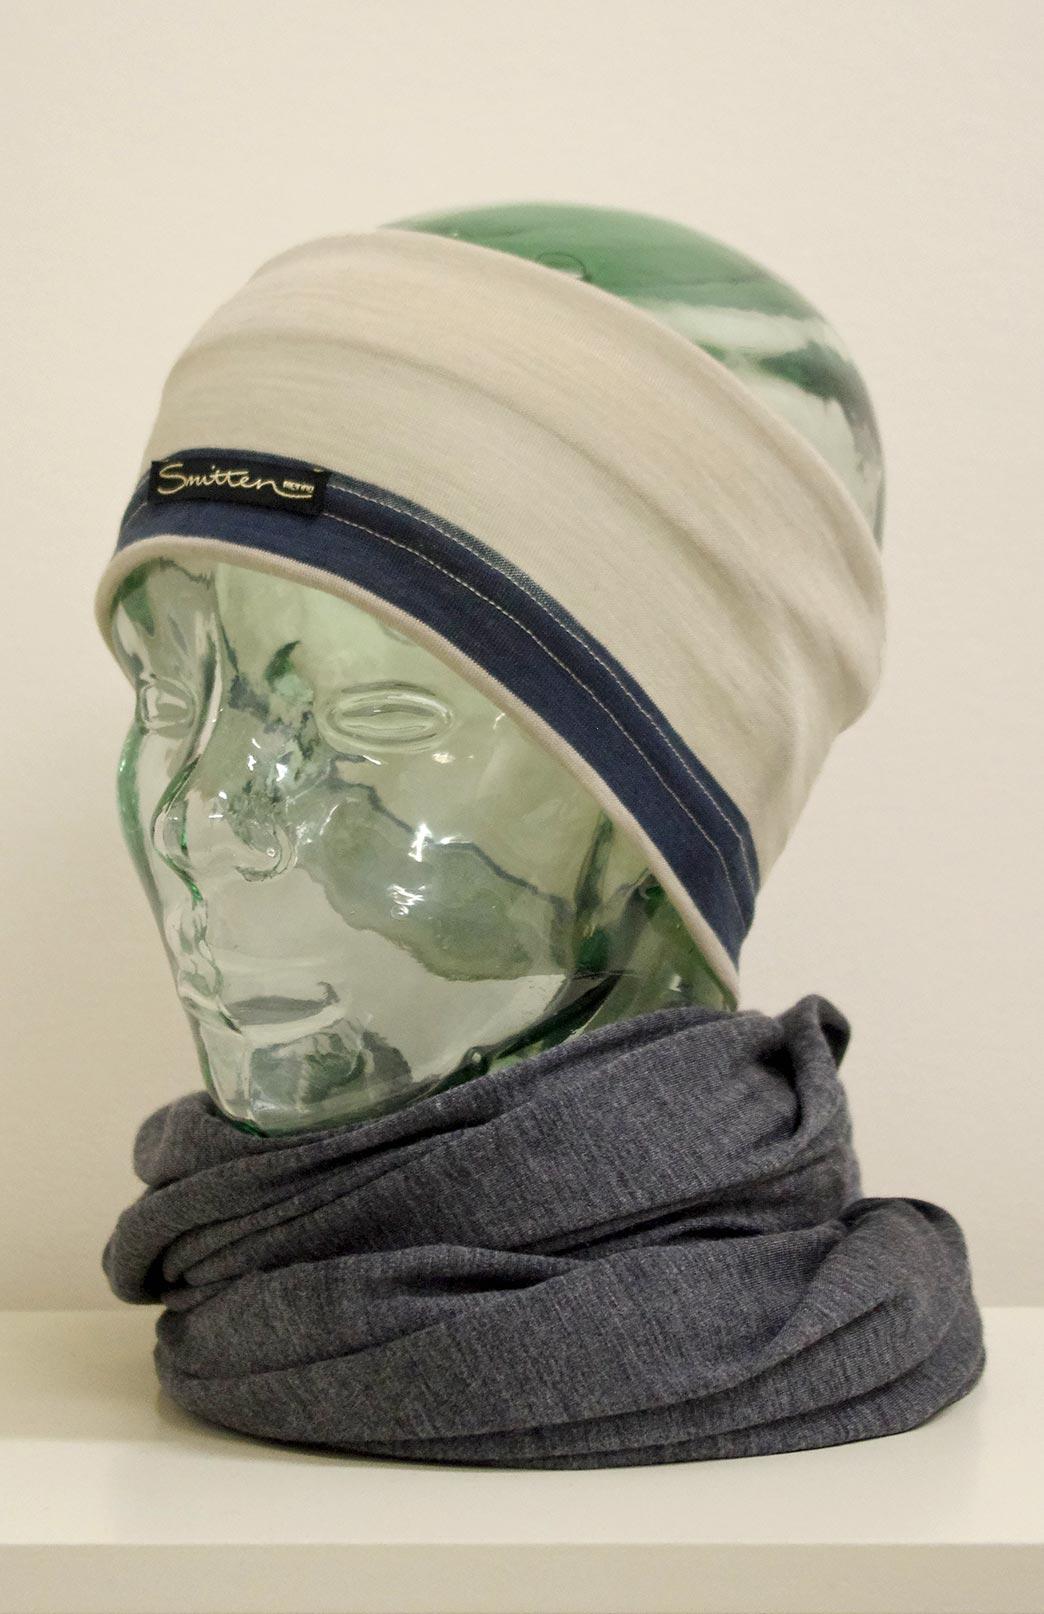 Headband / Ear Warmer - Unisex Ivory Multi Merino Wool Headband and Ear Warmer - Smitten Merino Tasmania Australia